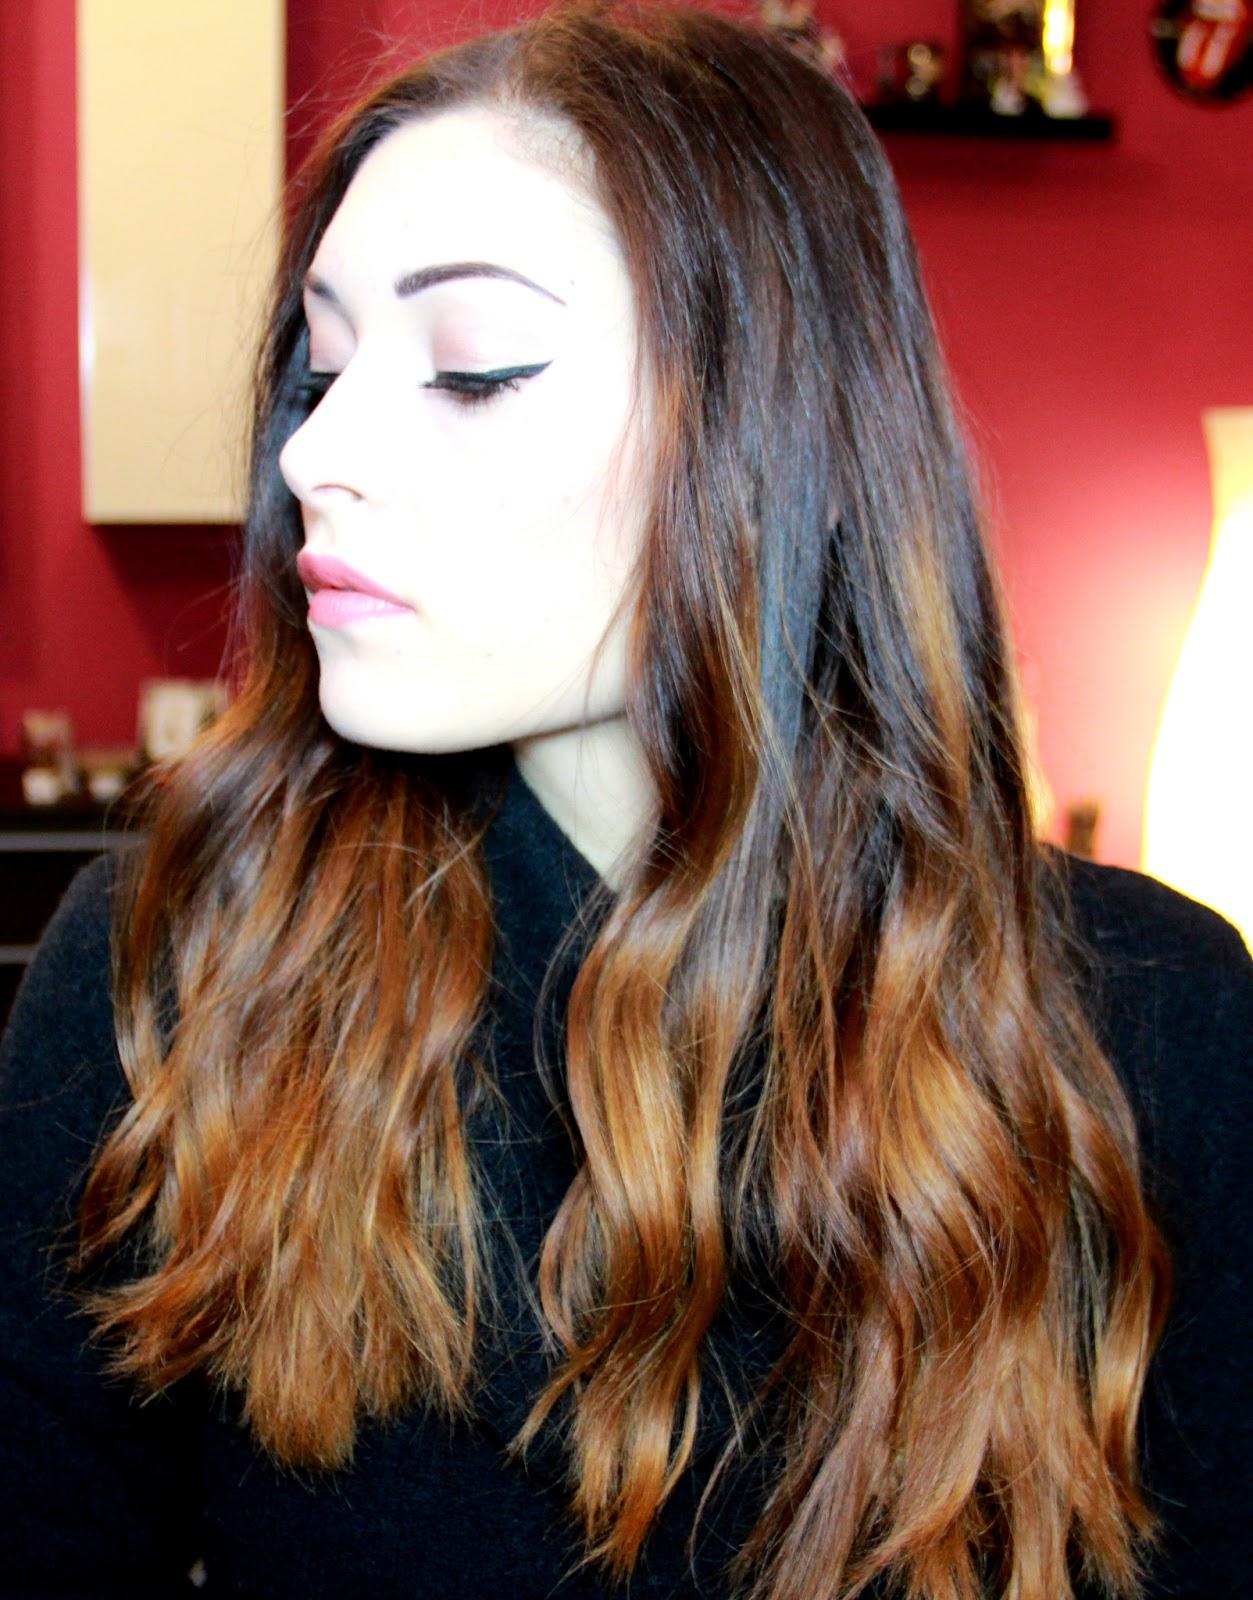 Cheryl s Pandemonium  DIY  Ombré hair a casa propria 770c27a7c30d